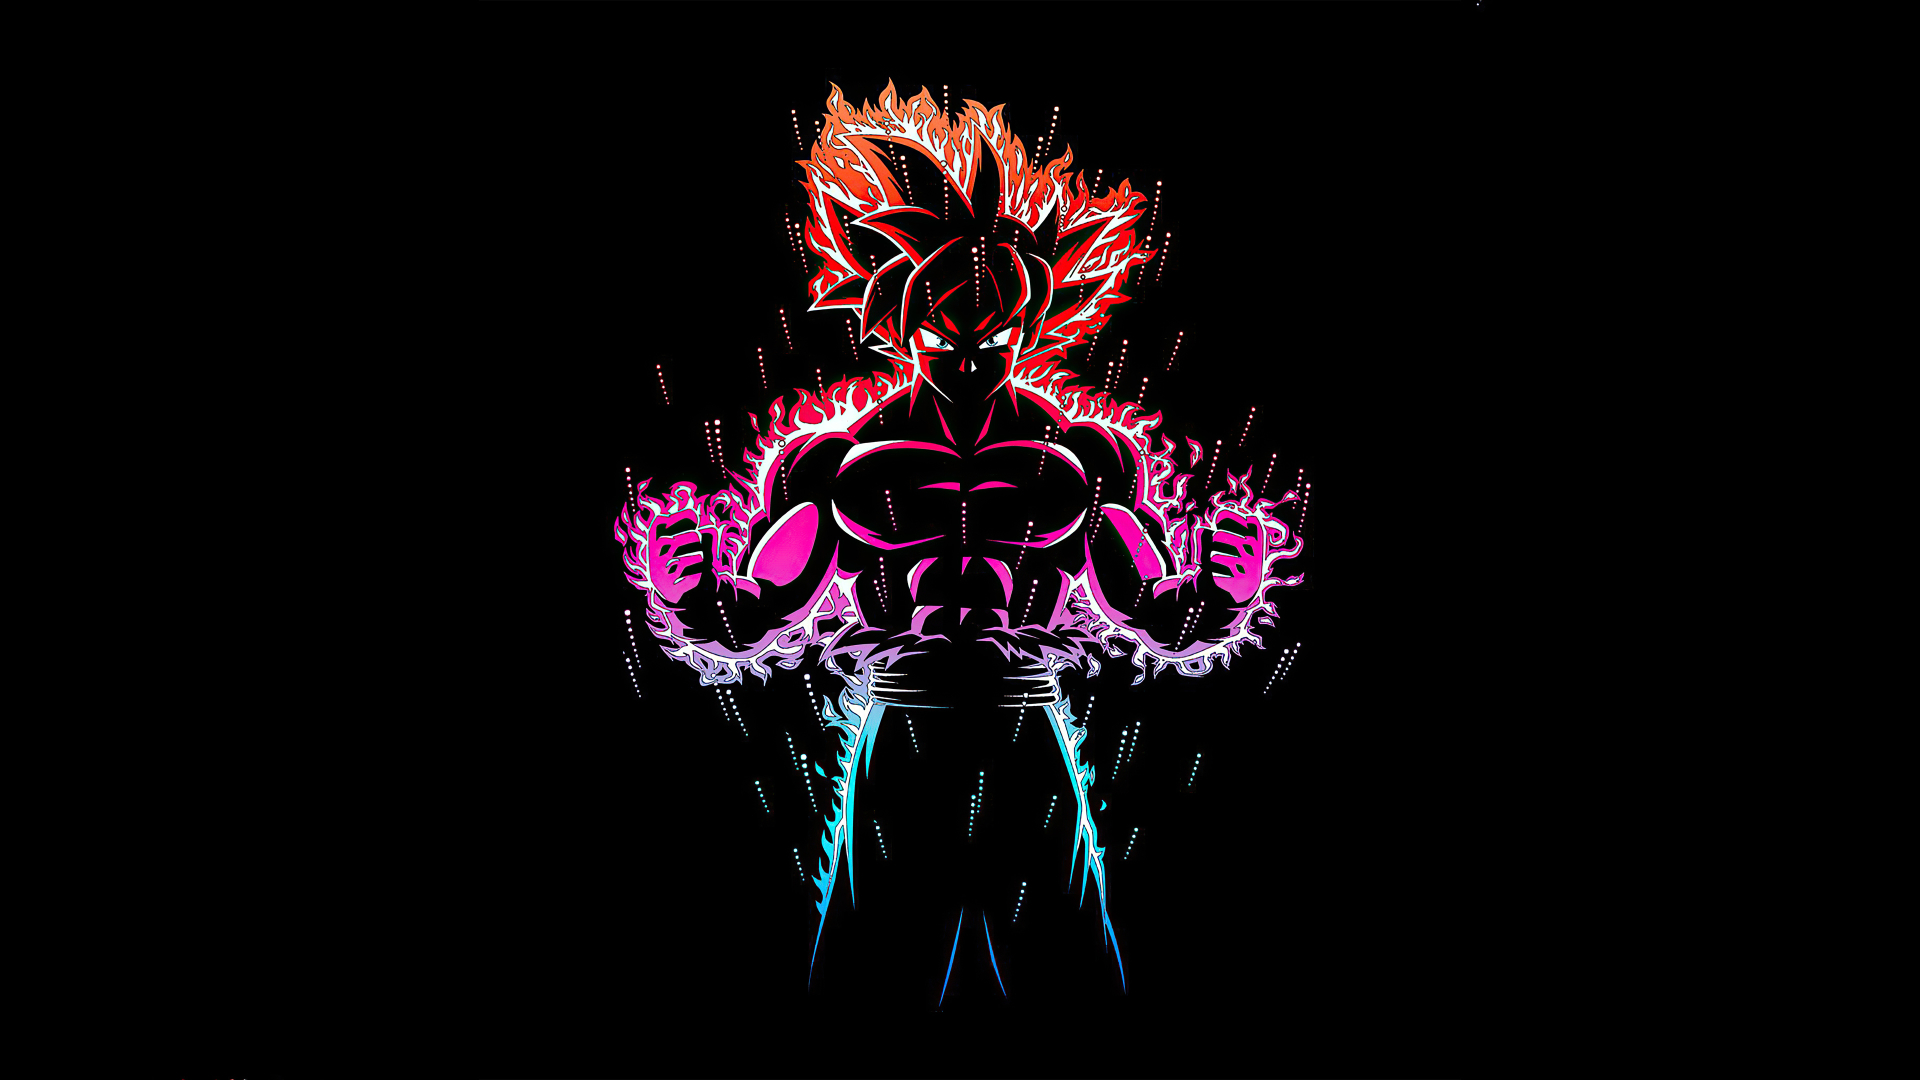 1920x1080 Dragon Ball Z Goku Ultra Instinct Fire 1080P Laptop Full HD Wallpaper, HD Anime 4K ...